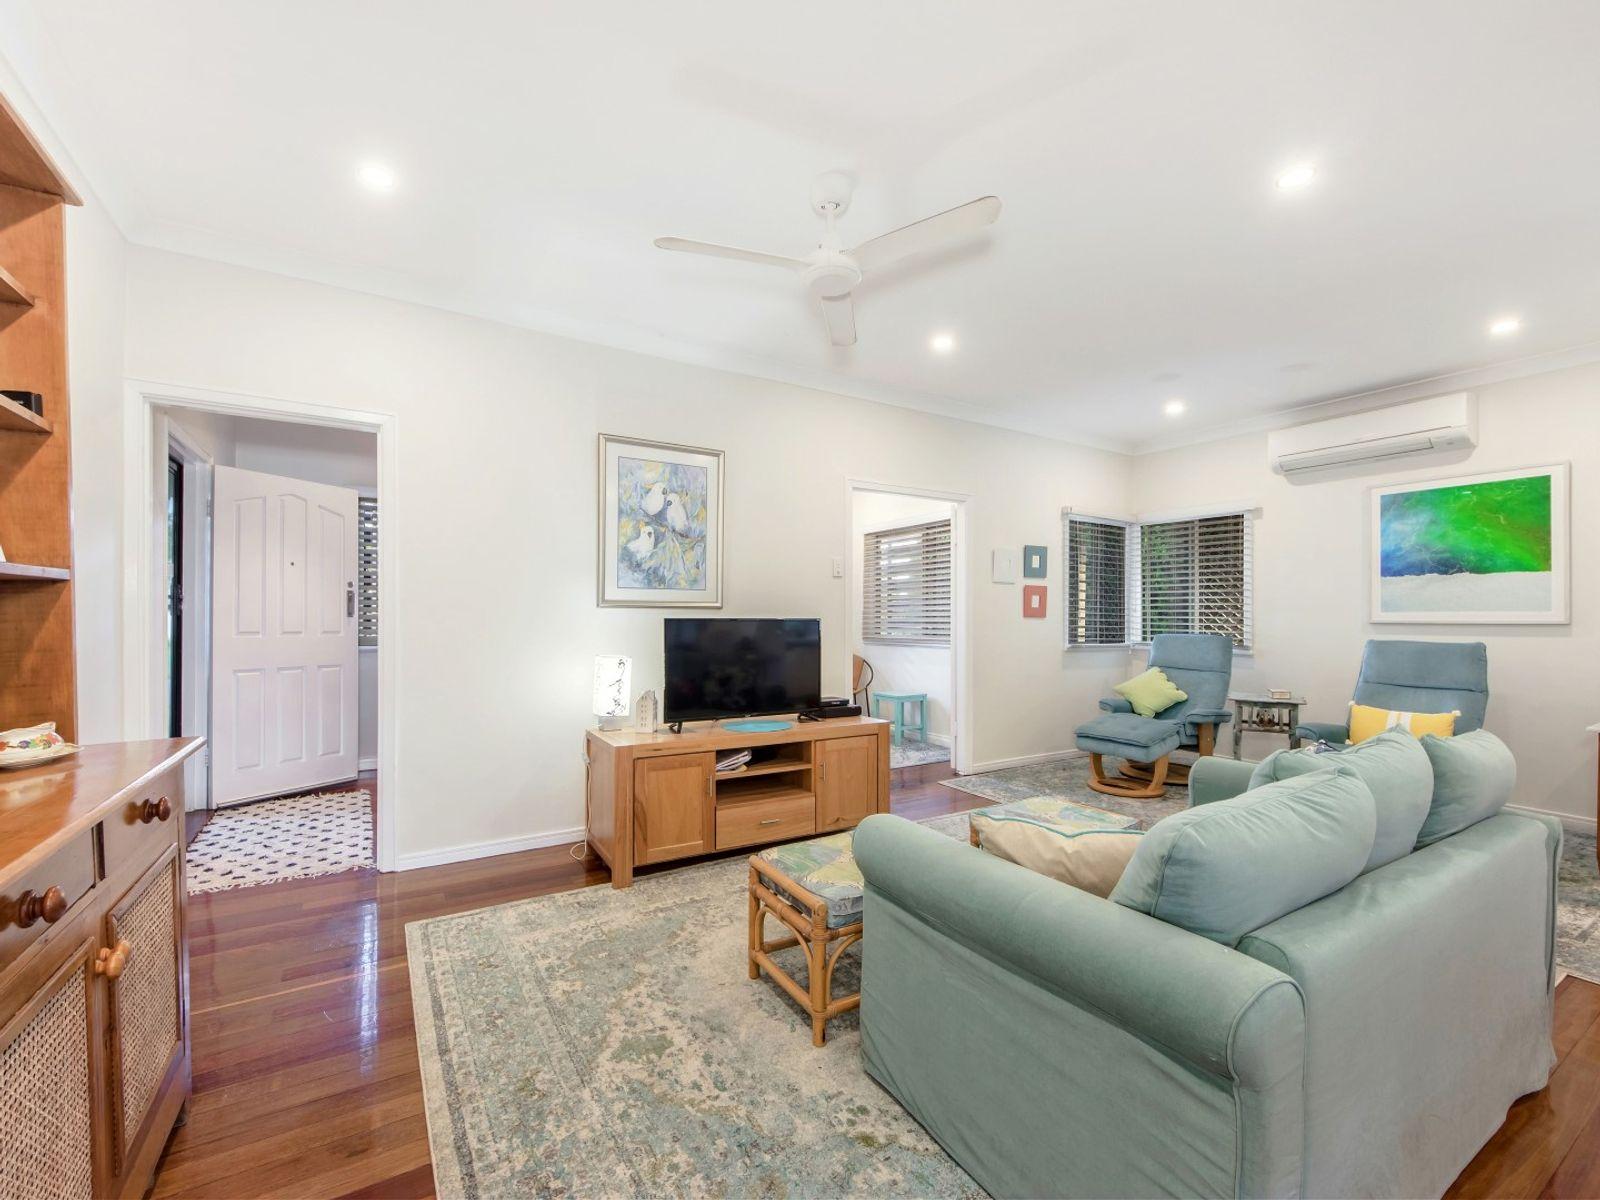 46 Lusitania Street, Newtown, QLD 4305